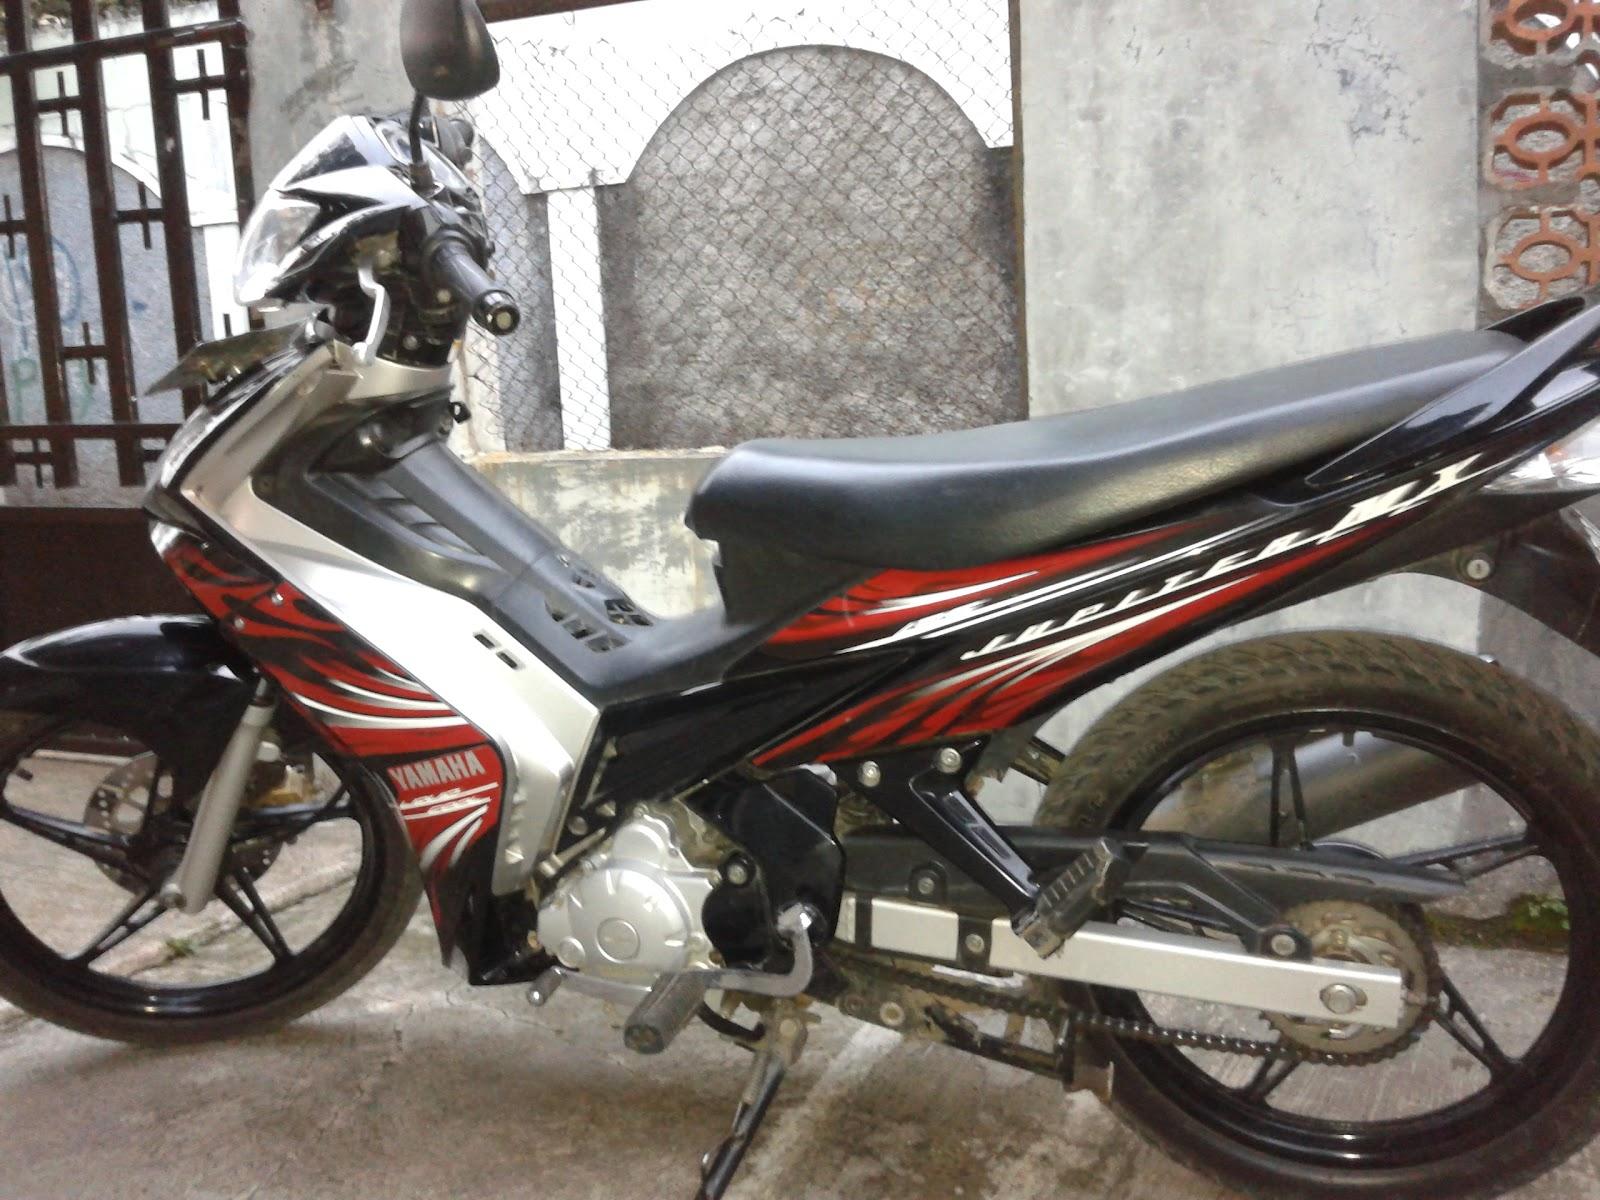 81 Modifikasi Motor Yamaha Jupiter Mx 2010 Terlengkap Kinyis Motor